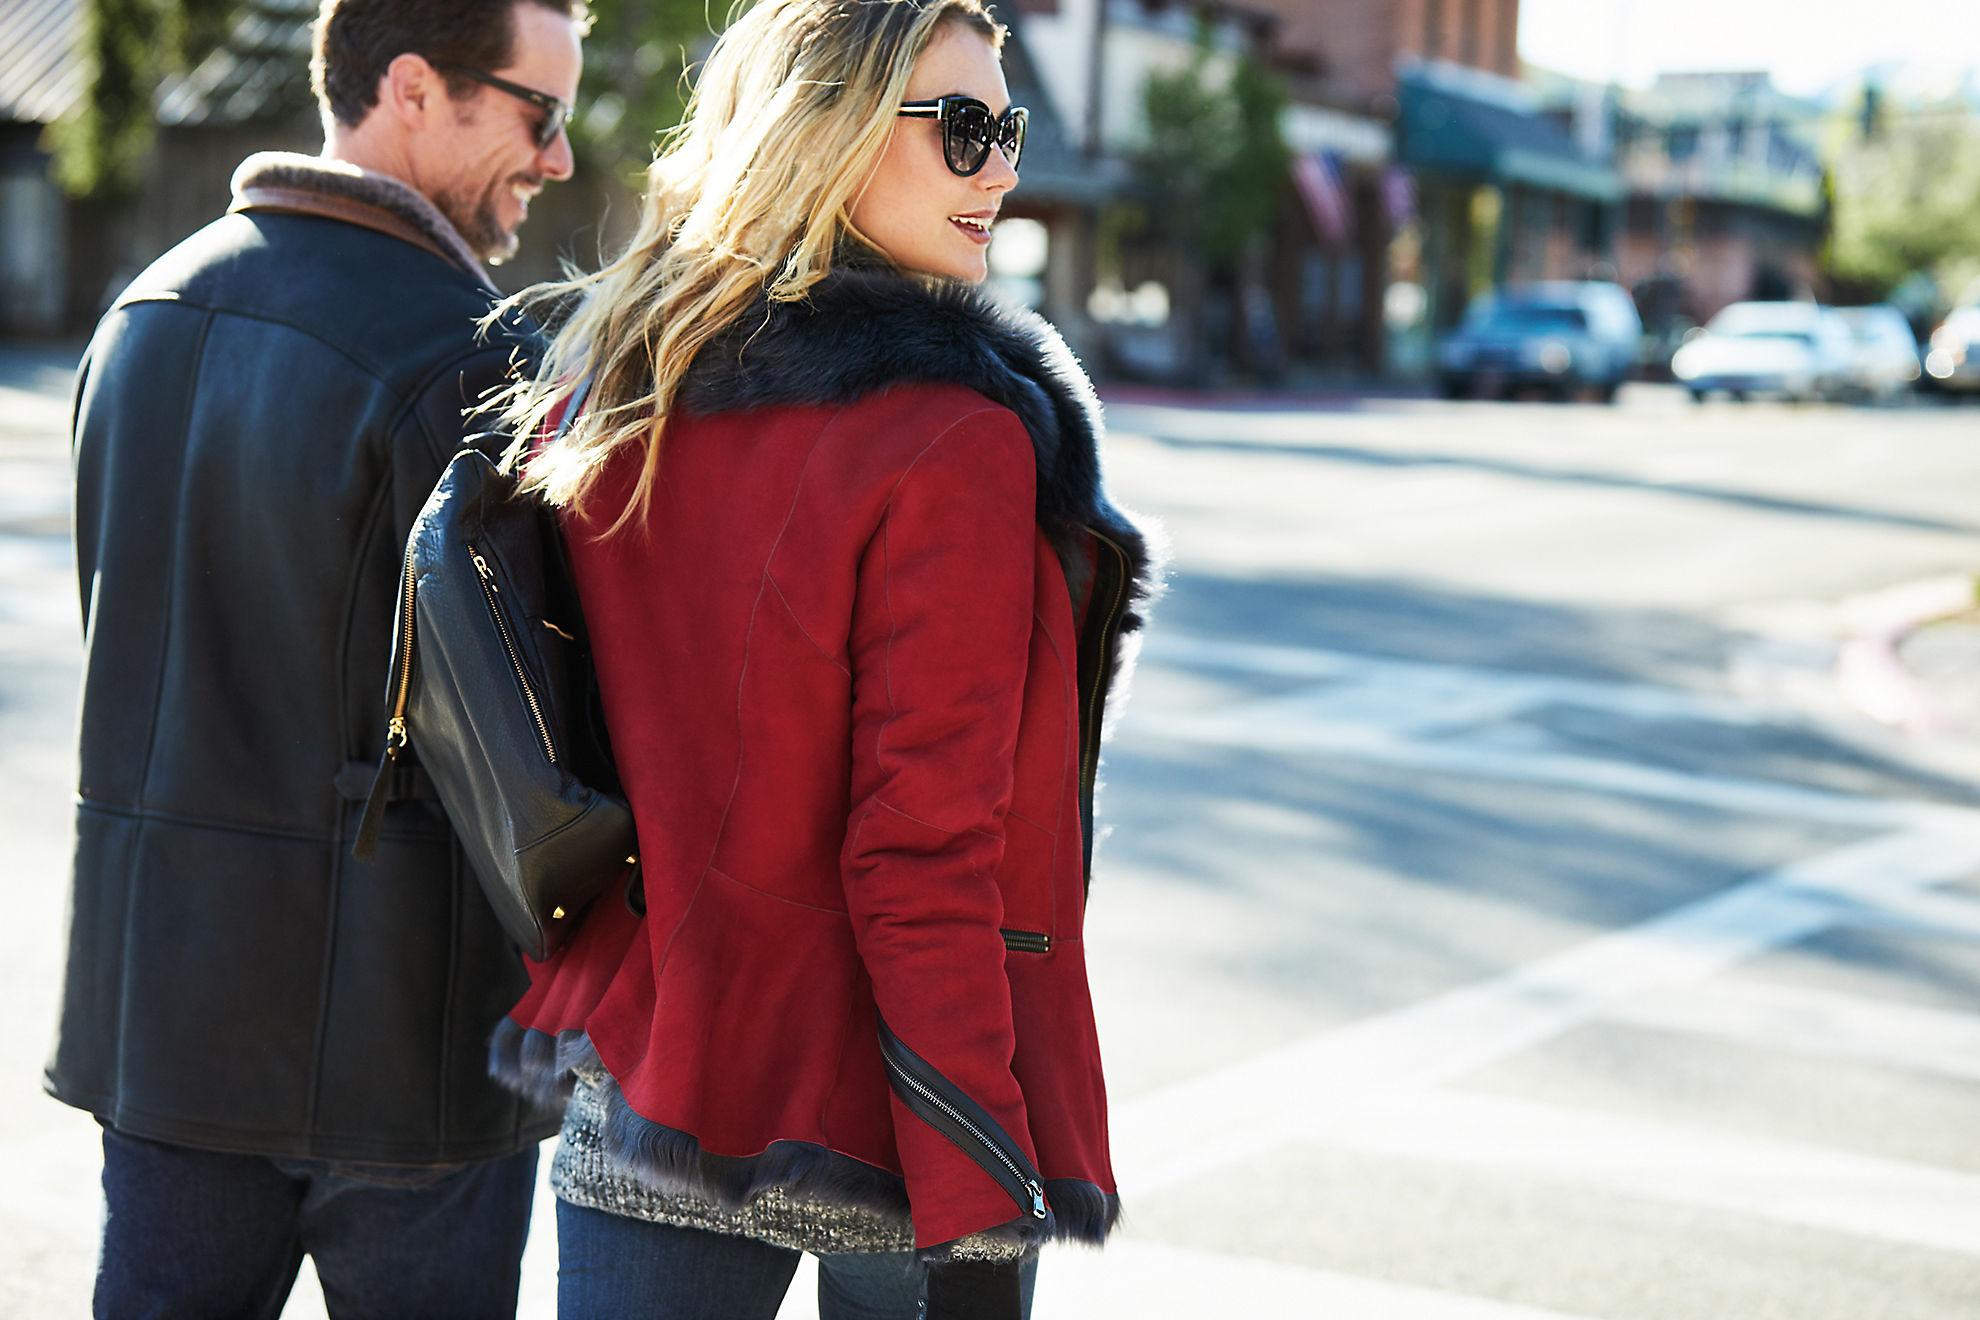 Scarlett Asymmetric Toscana Sheepskin Jacket